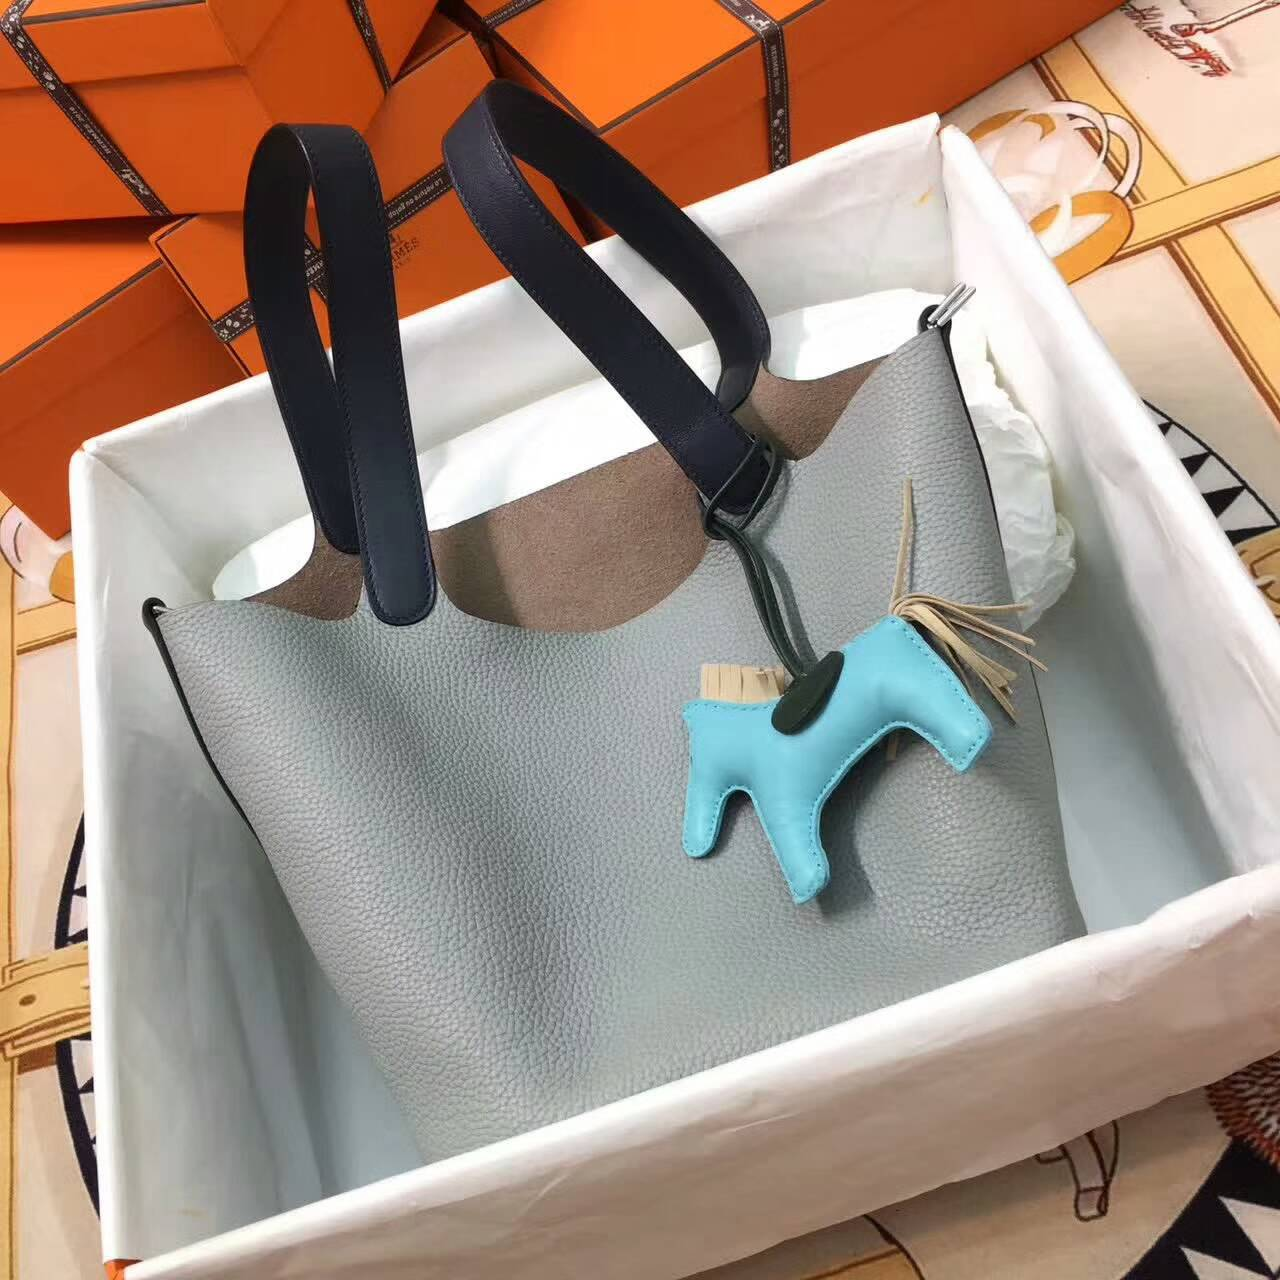 Hermes爱马仕菜篮子 Picotin Lock 22cm Clememce 法国原产Tc皮 80 Gris Perle 珍珠灰拼73 Blue Saphir 宝石蓝 银扣